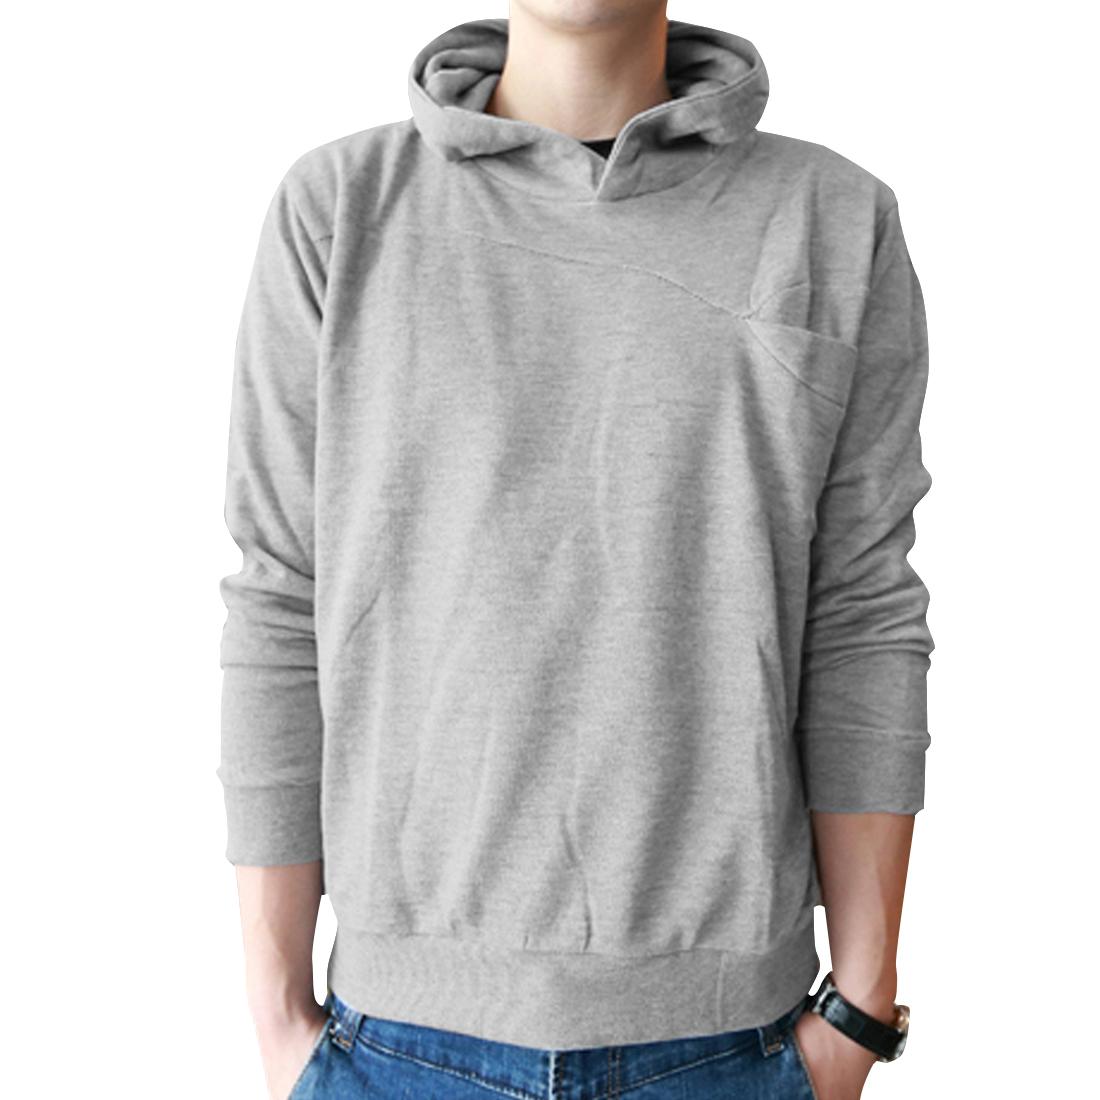 Men Light Grey L Long Sleeve Design Solid Color Pullover Stylish Hoodies